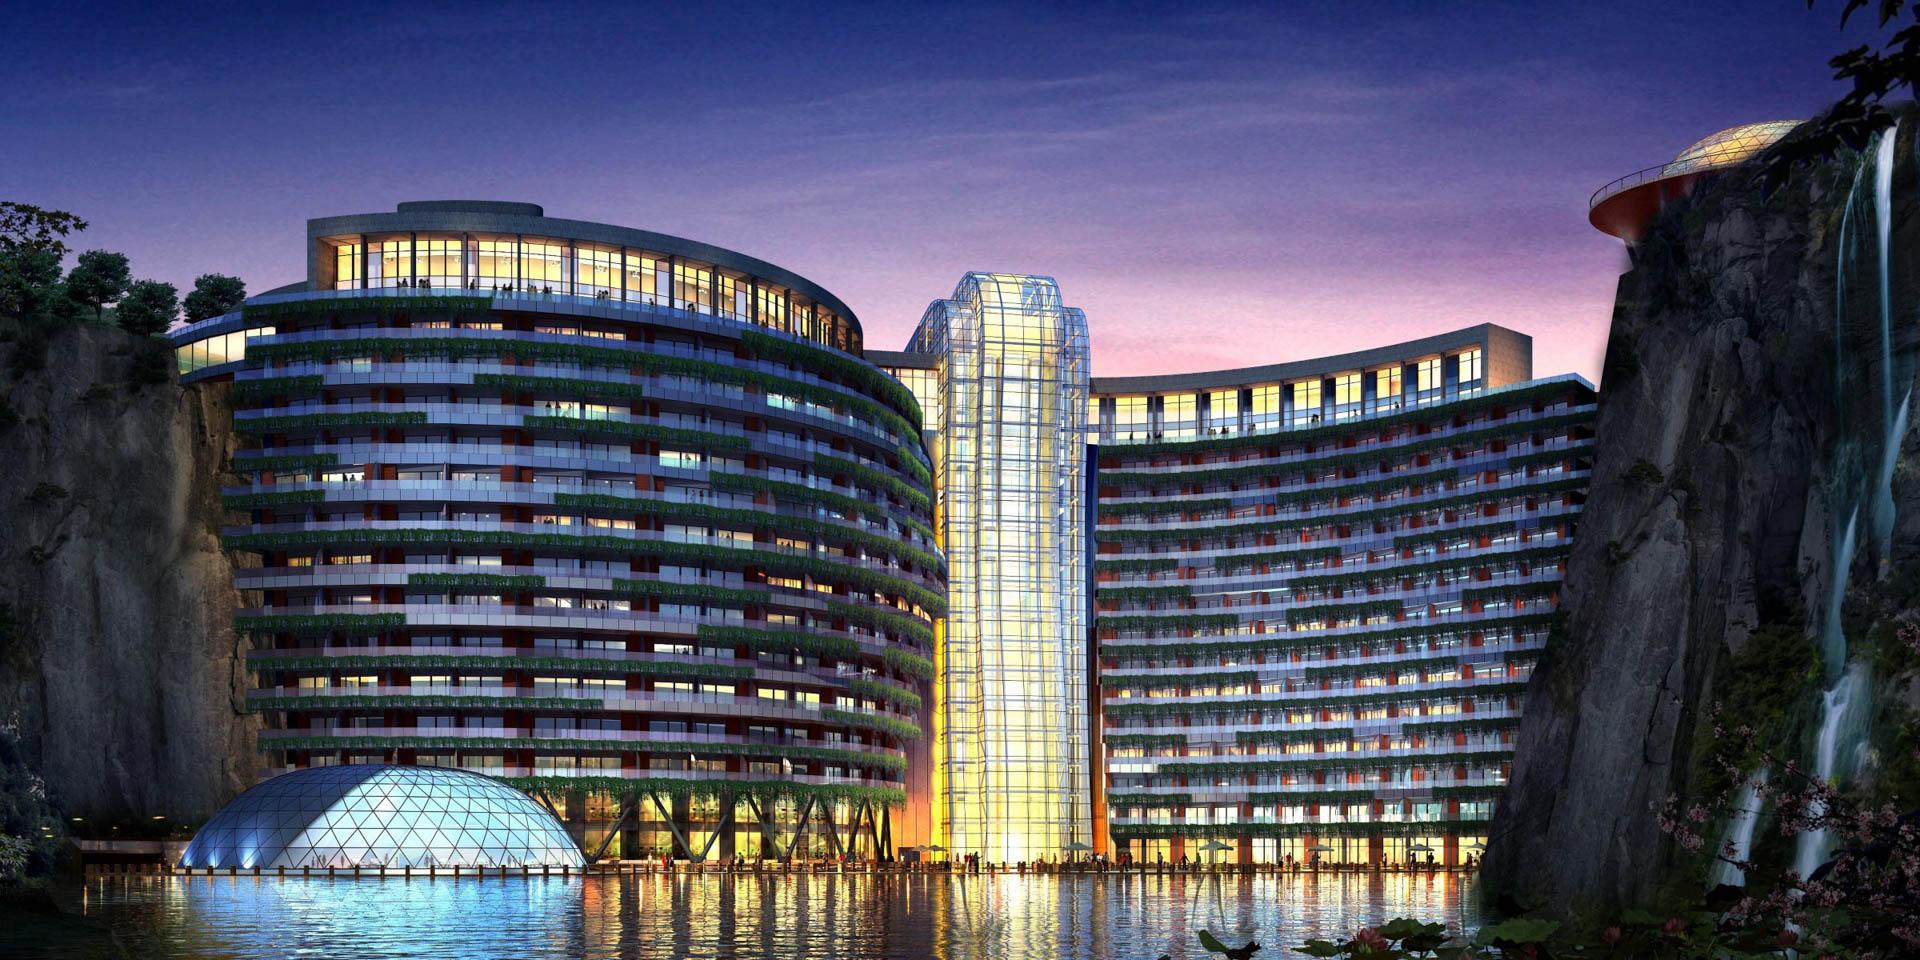 Groundscraper-Shanghai-Hotel-3-of-3